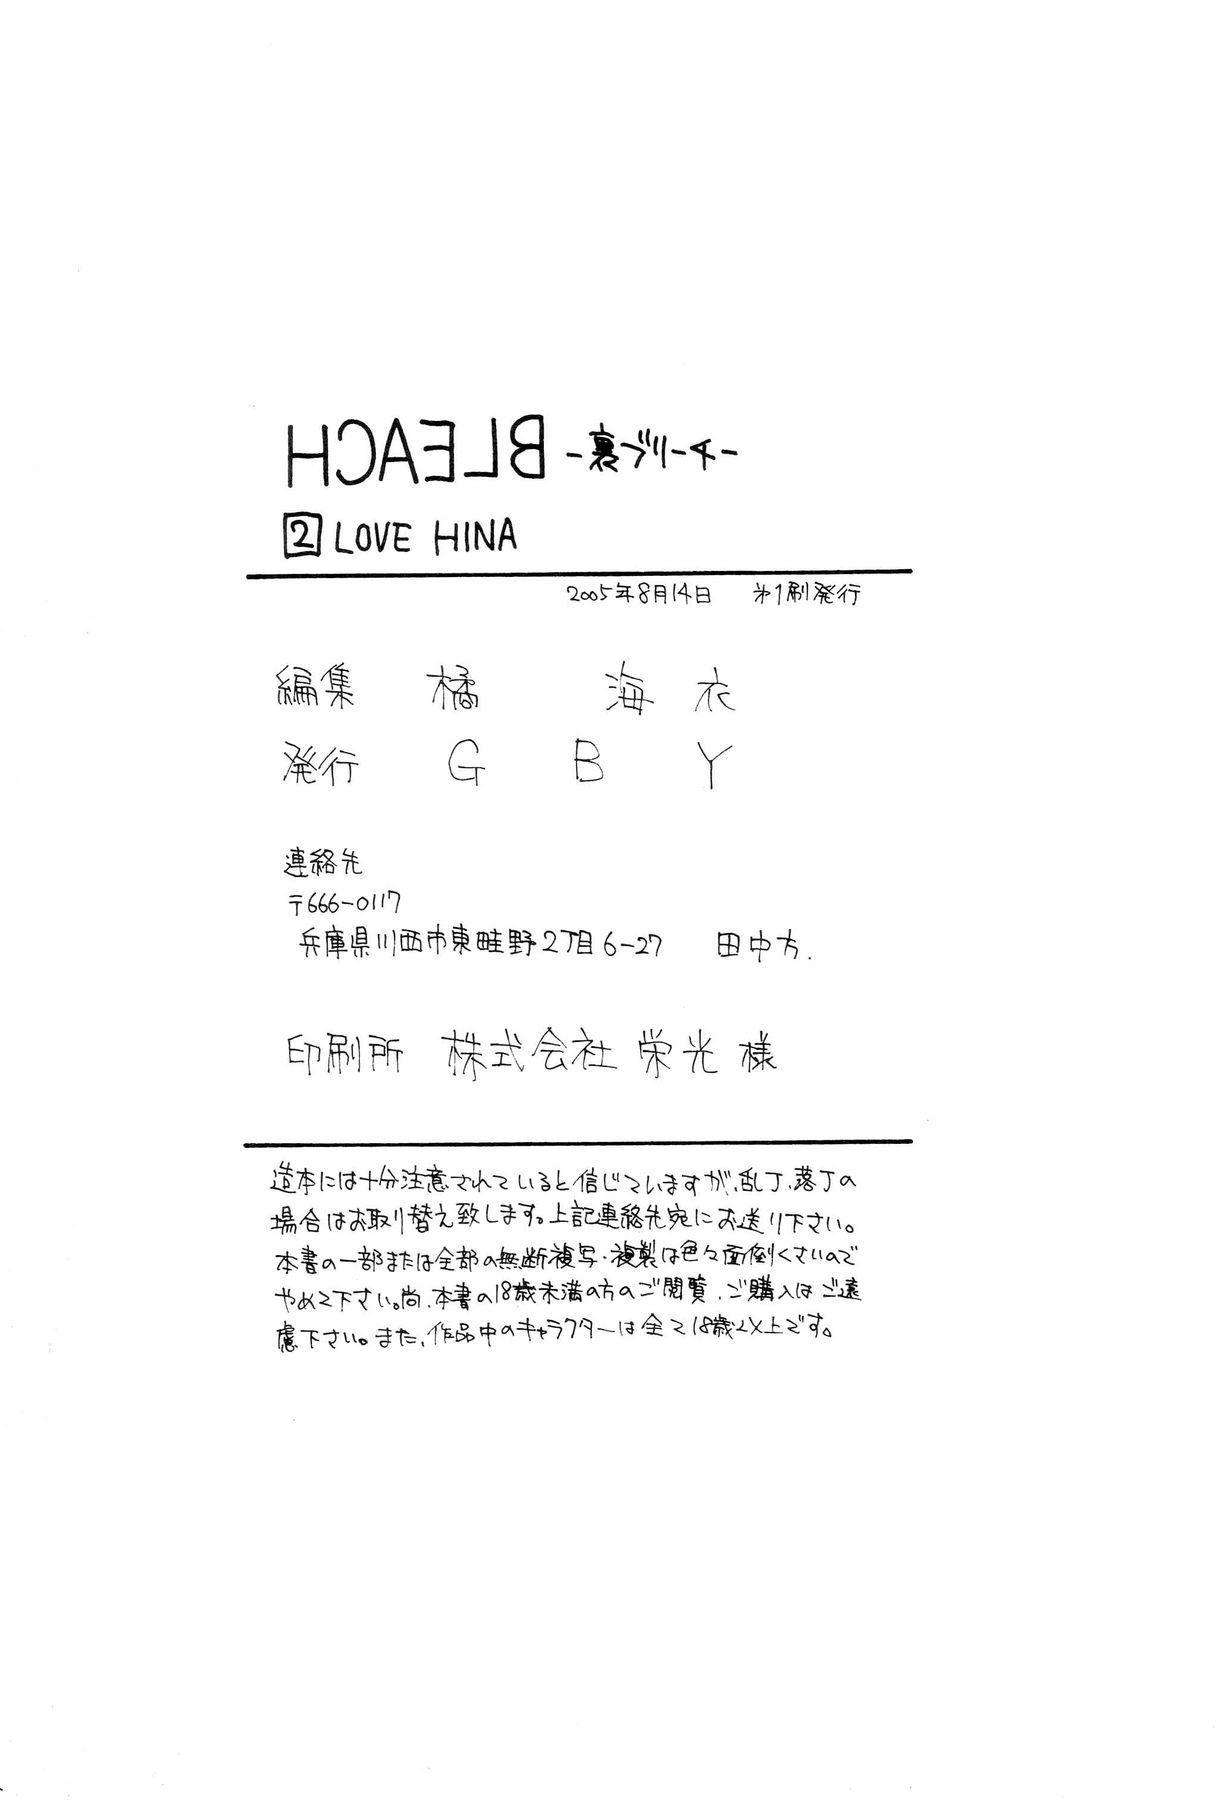 HCAELB 22